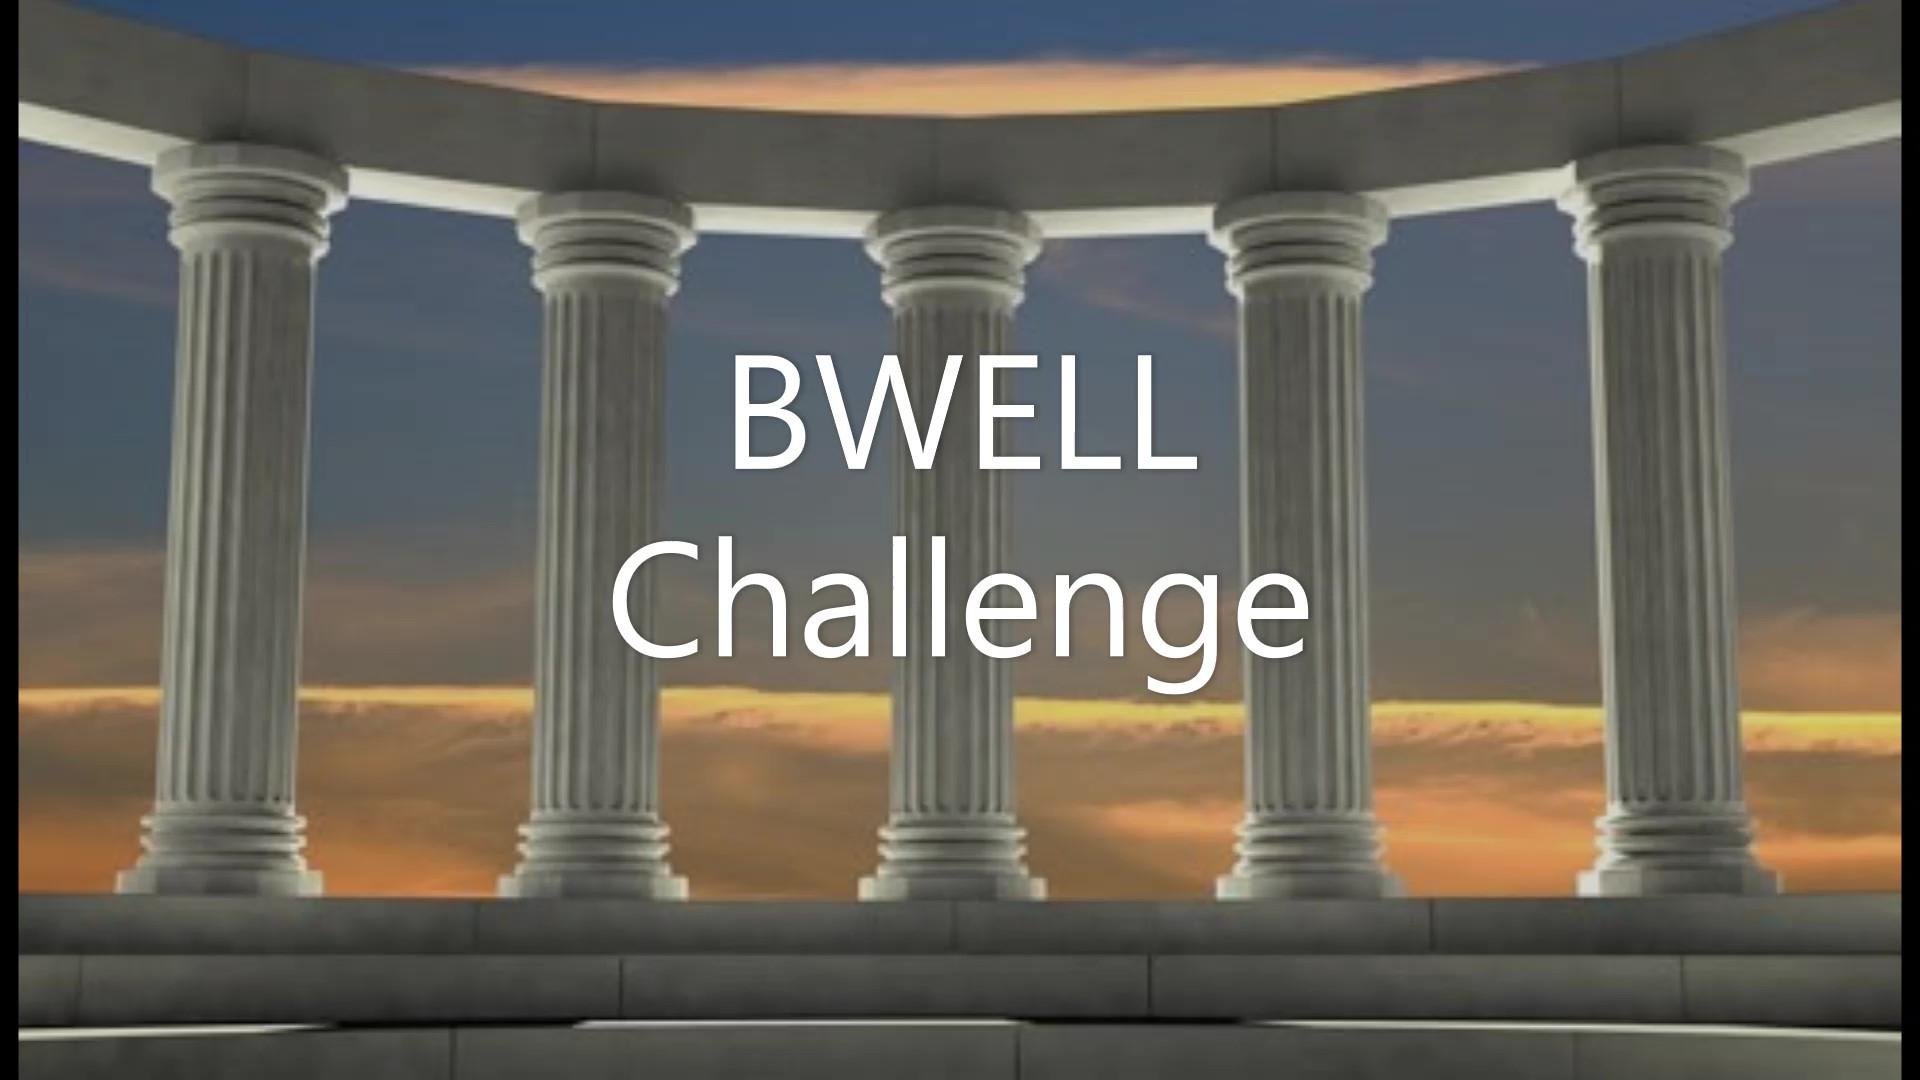 Individual BWELL Challenge